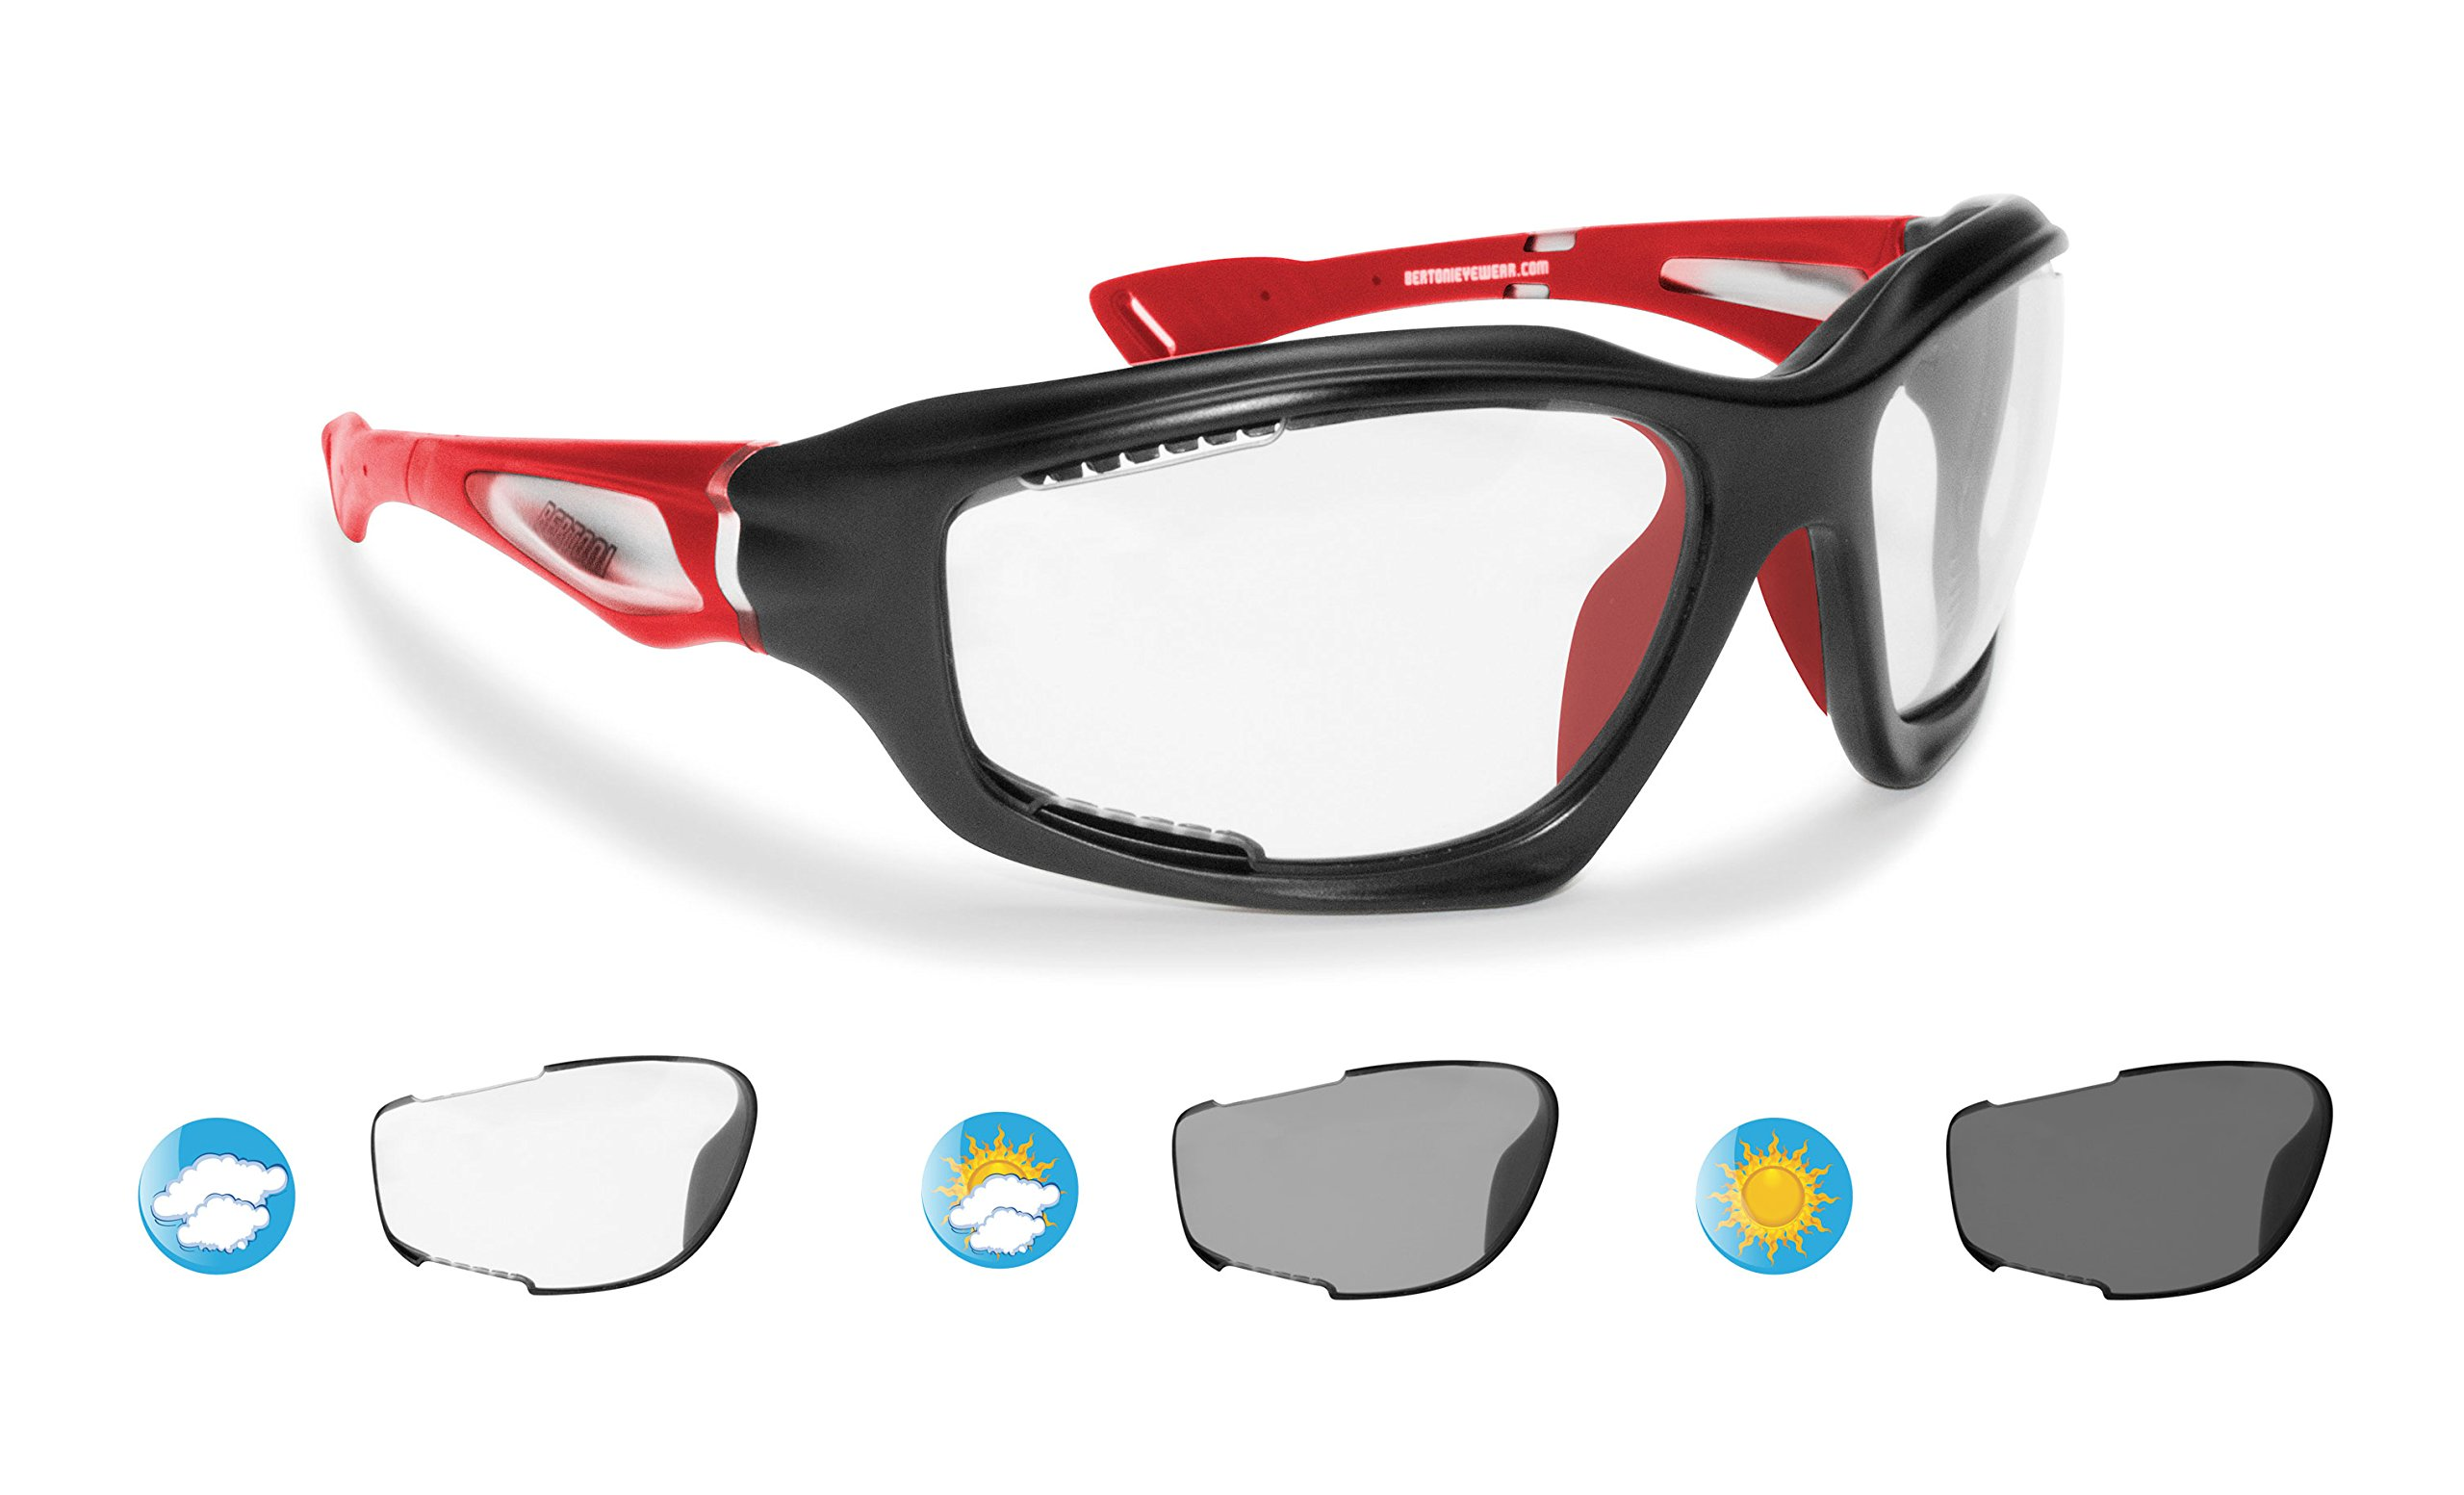 Bertoni Sport Photochromic Antifog Sunglasses cat. 0-3 - Cycling Running Golf Ski Watersports - Anticrash Ventilated Lenses Italy-F1000B1 Mat Black/Red - Wraparound Windproof Sports Glasses